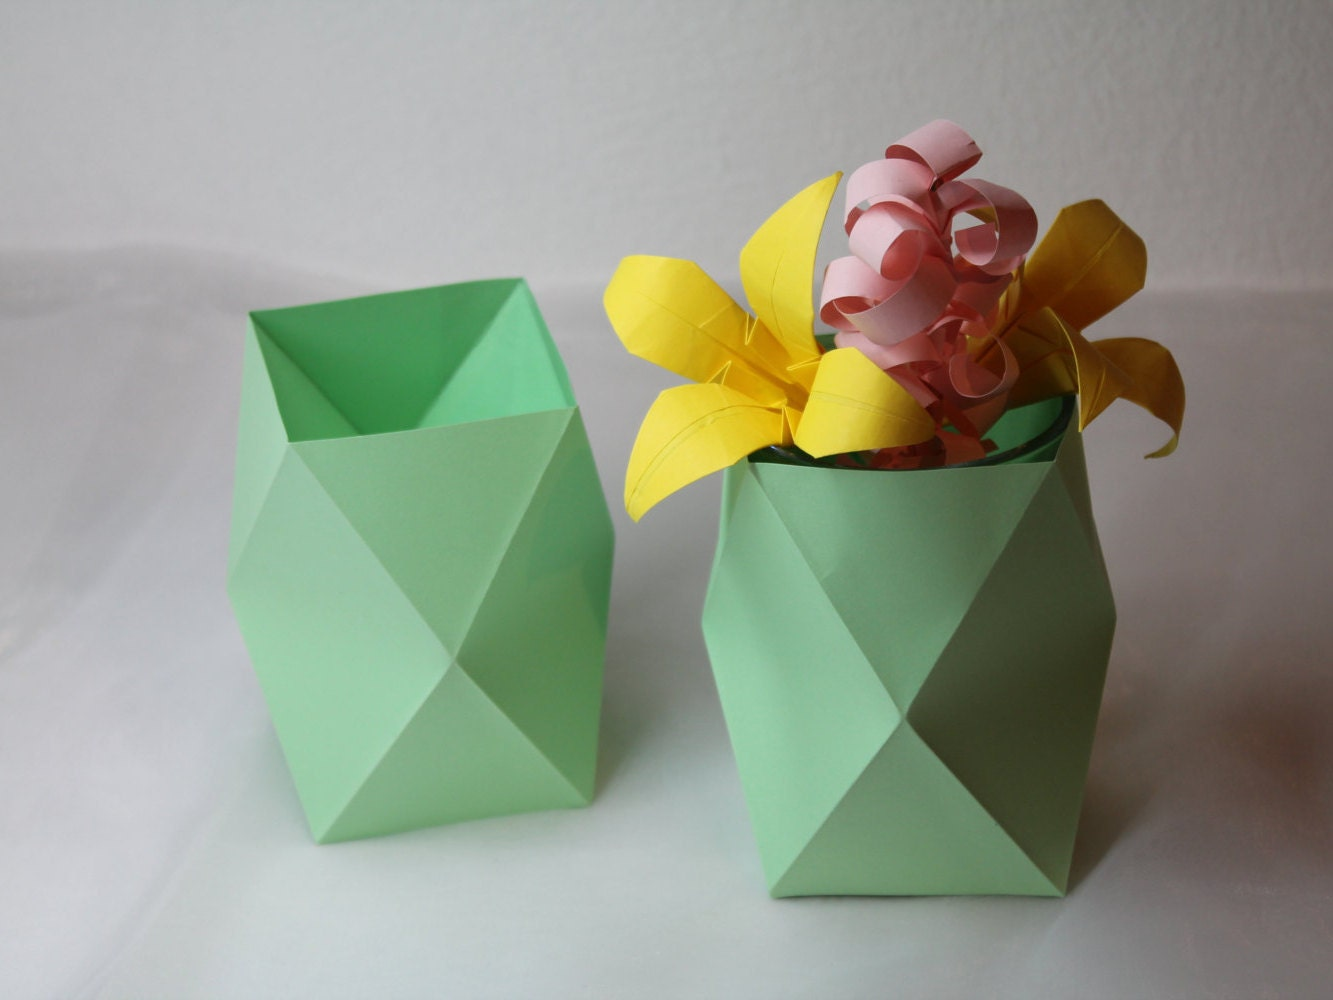 2pcs origami vase  flower vase  home decor  vases  paper